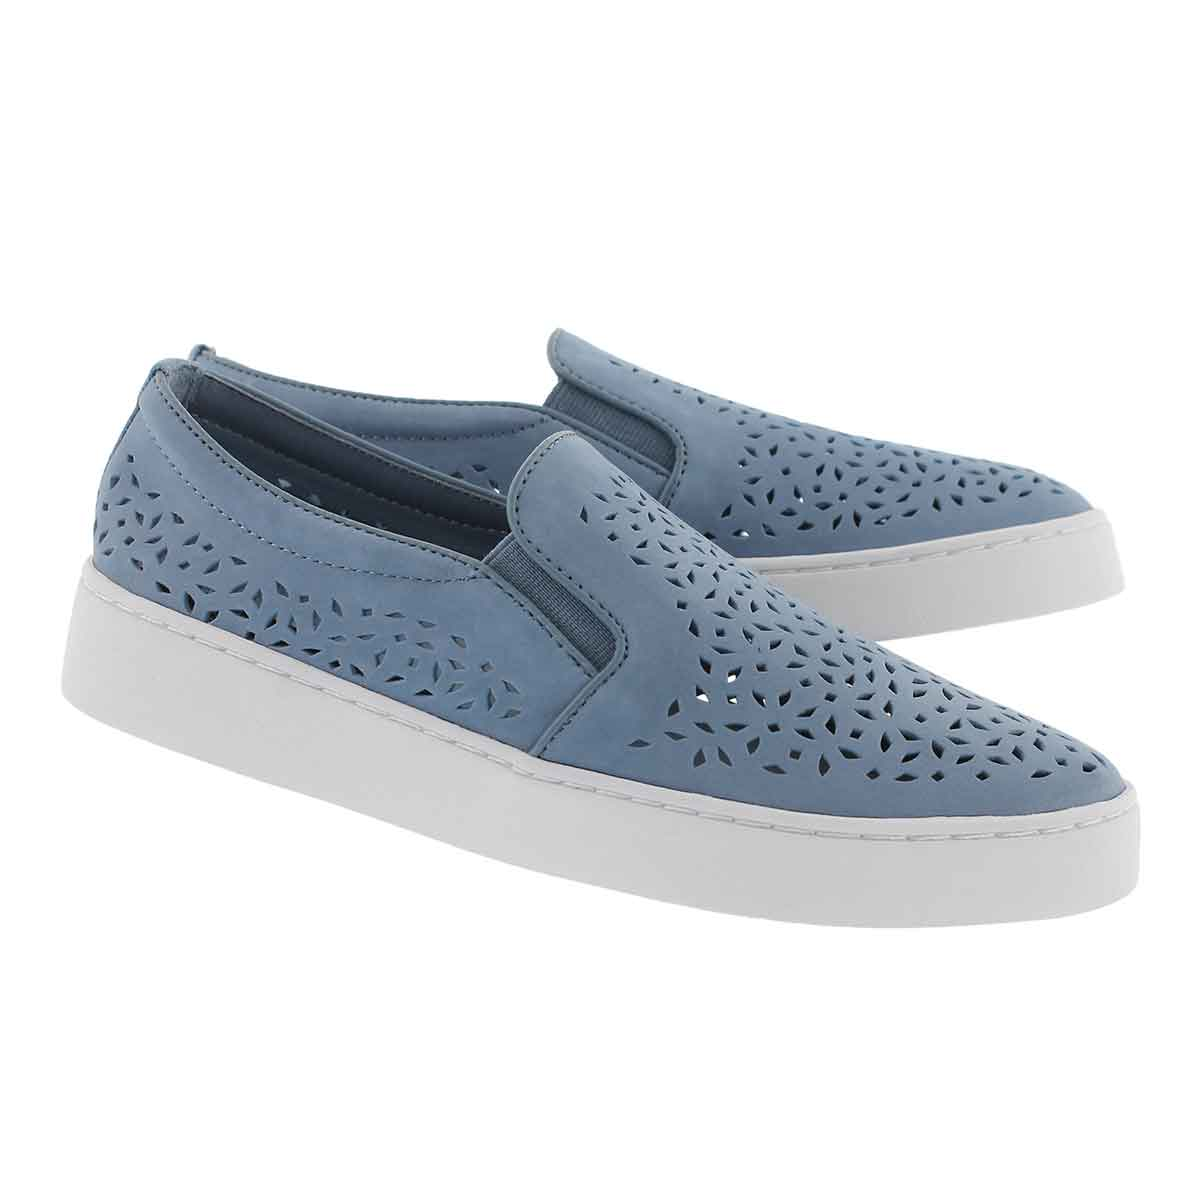 Lds Midi Perf lt blu casual slip on shoe